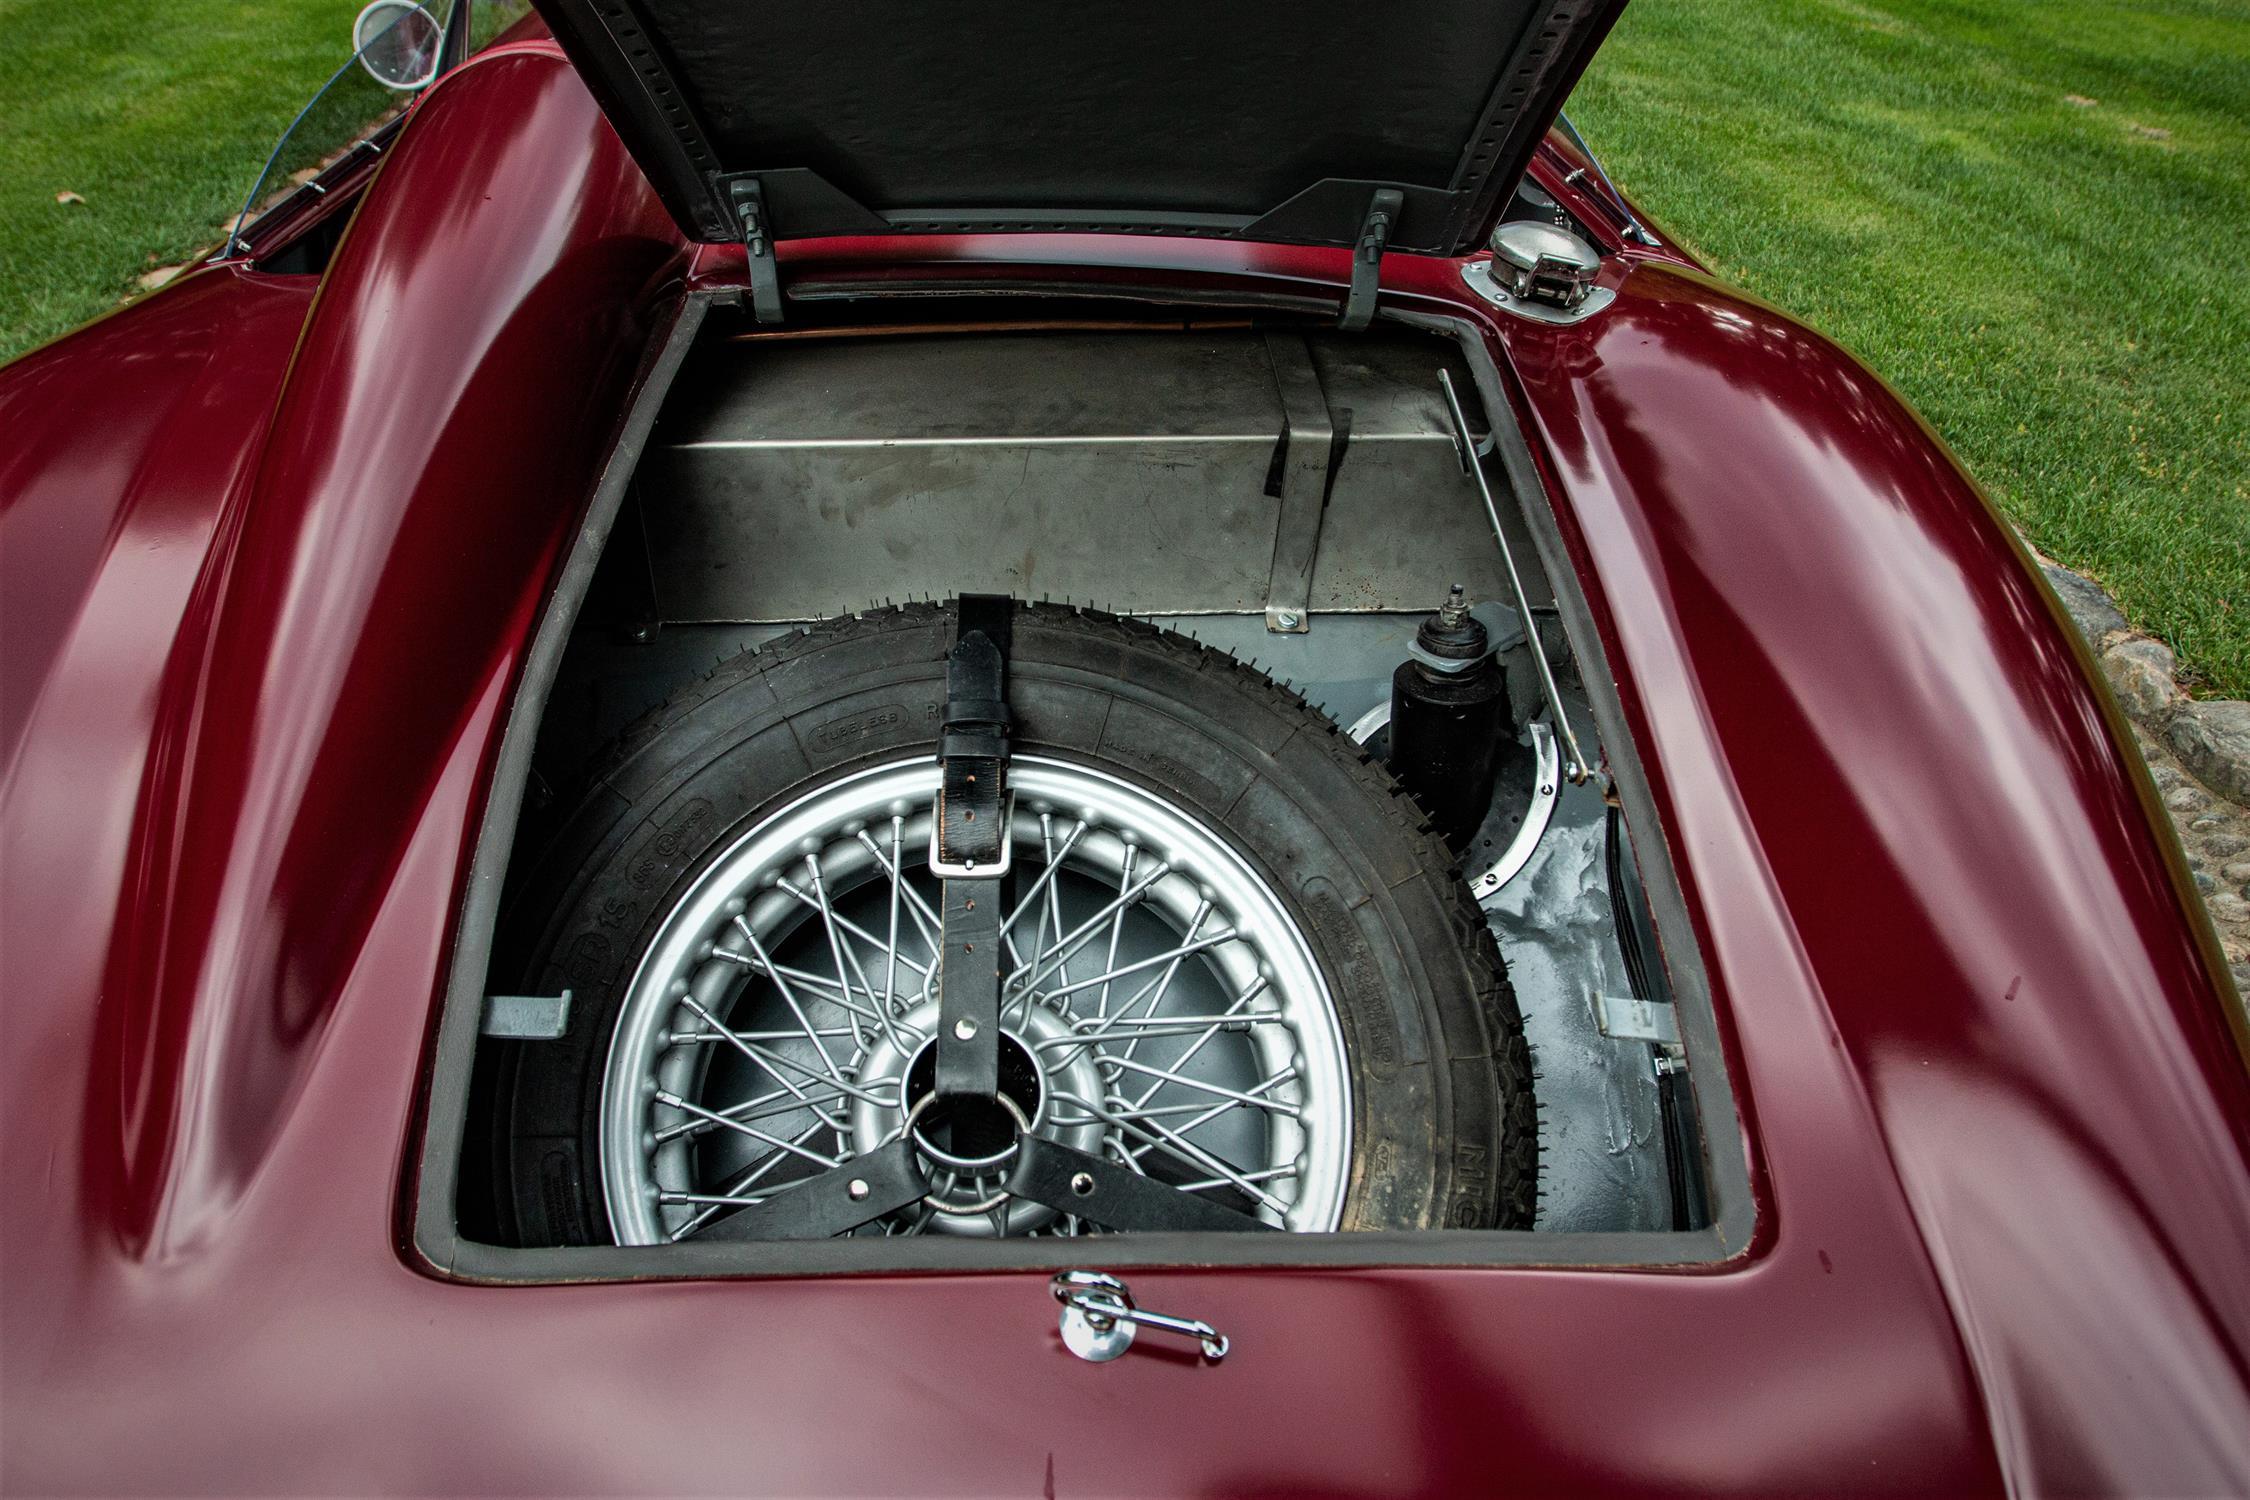 1952 Alfa 1900 ATL Barchetta - Image 8 of 10